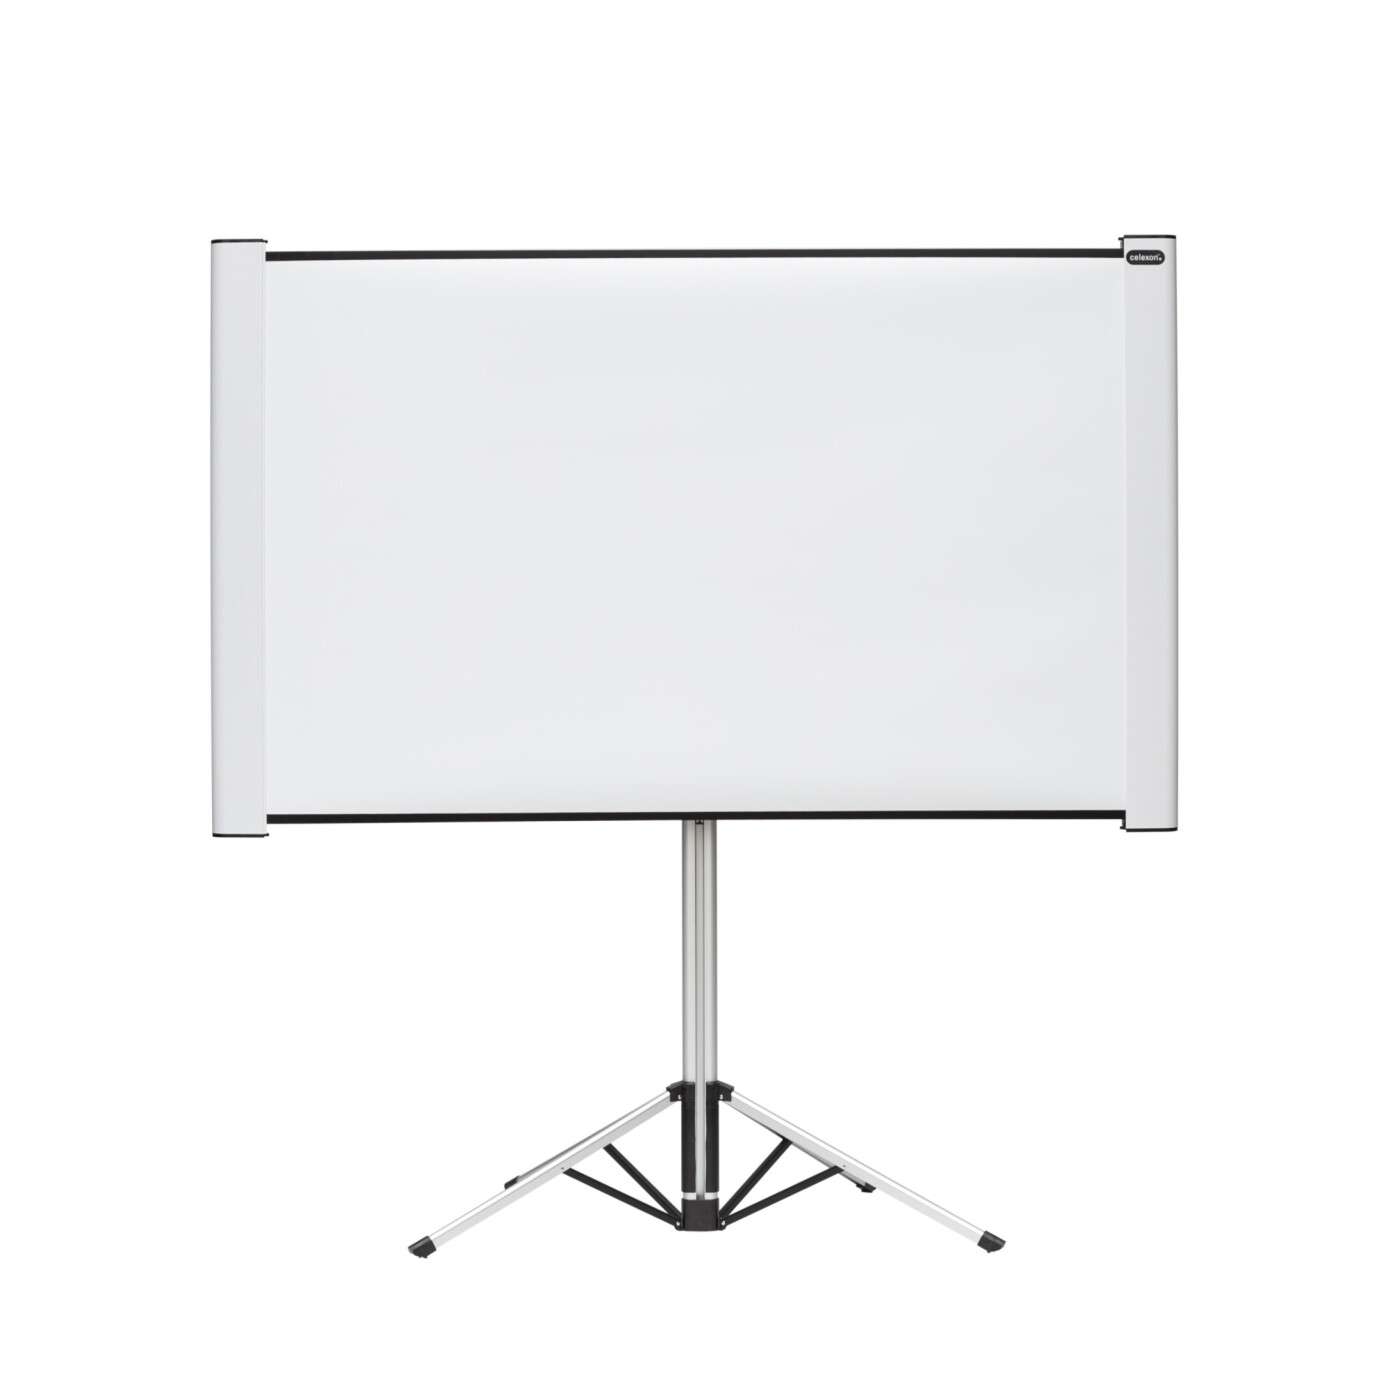 Celexon - Dual Format Tripod Screen - 172cm x 108cm or 144cm x 108cm - 4:3 or 16:10